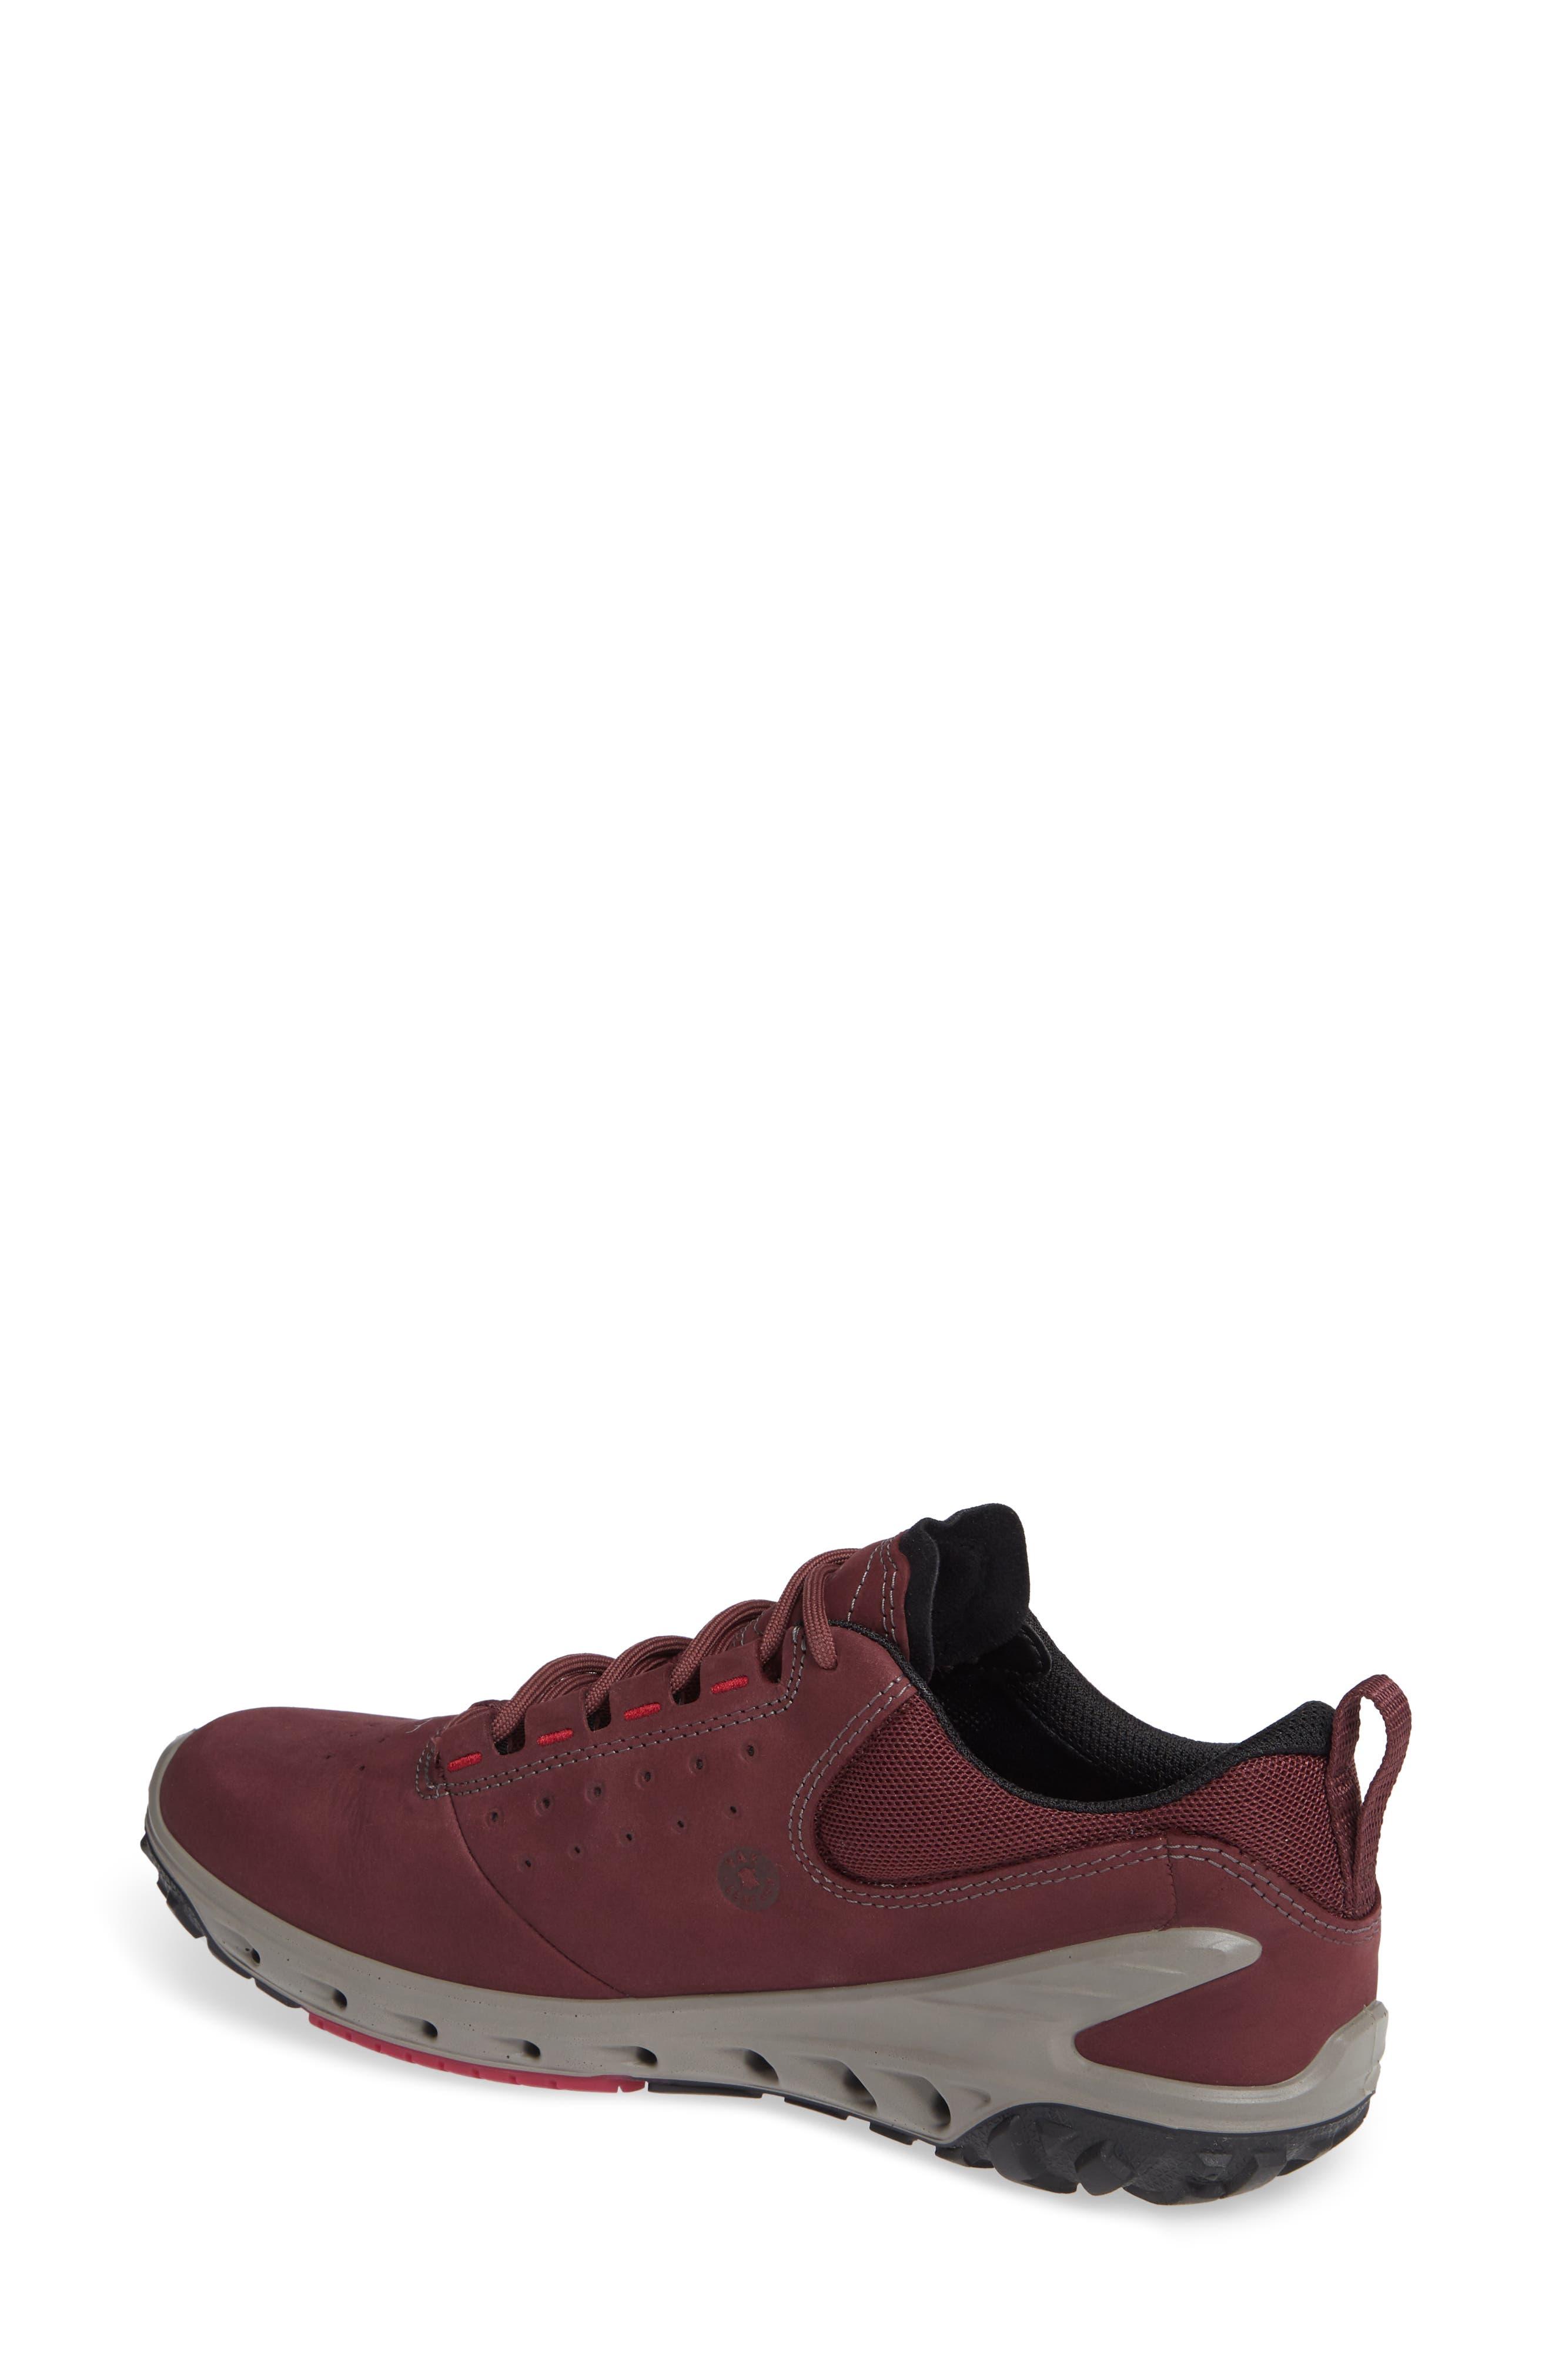 BIOM Venture GTX Sneaker,                             Alternate thumbnail 2, color,                             WINE NUBUCK LEATHER